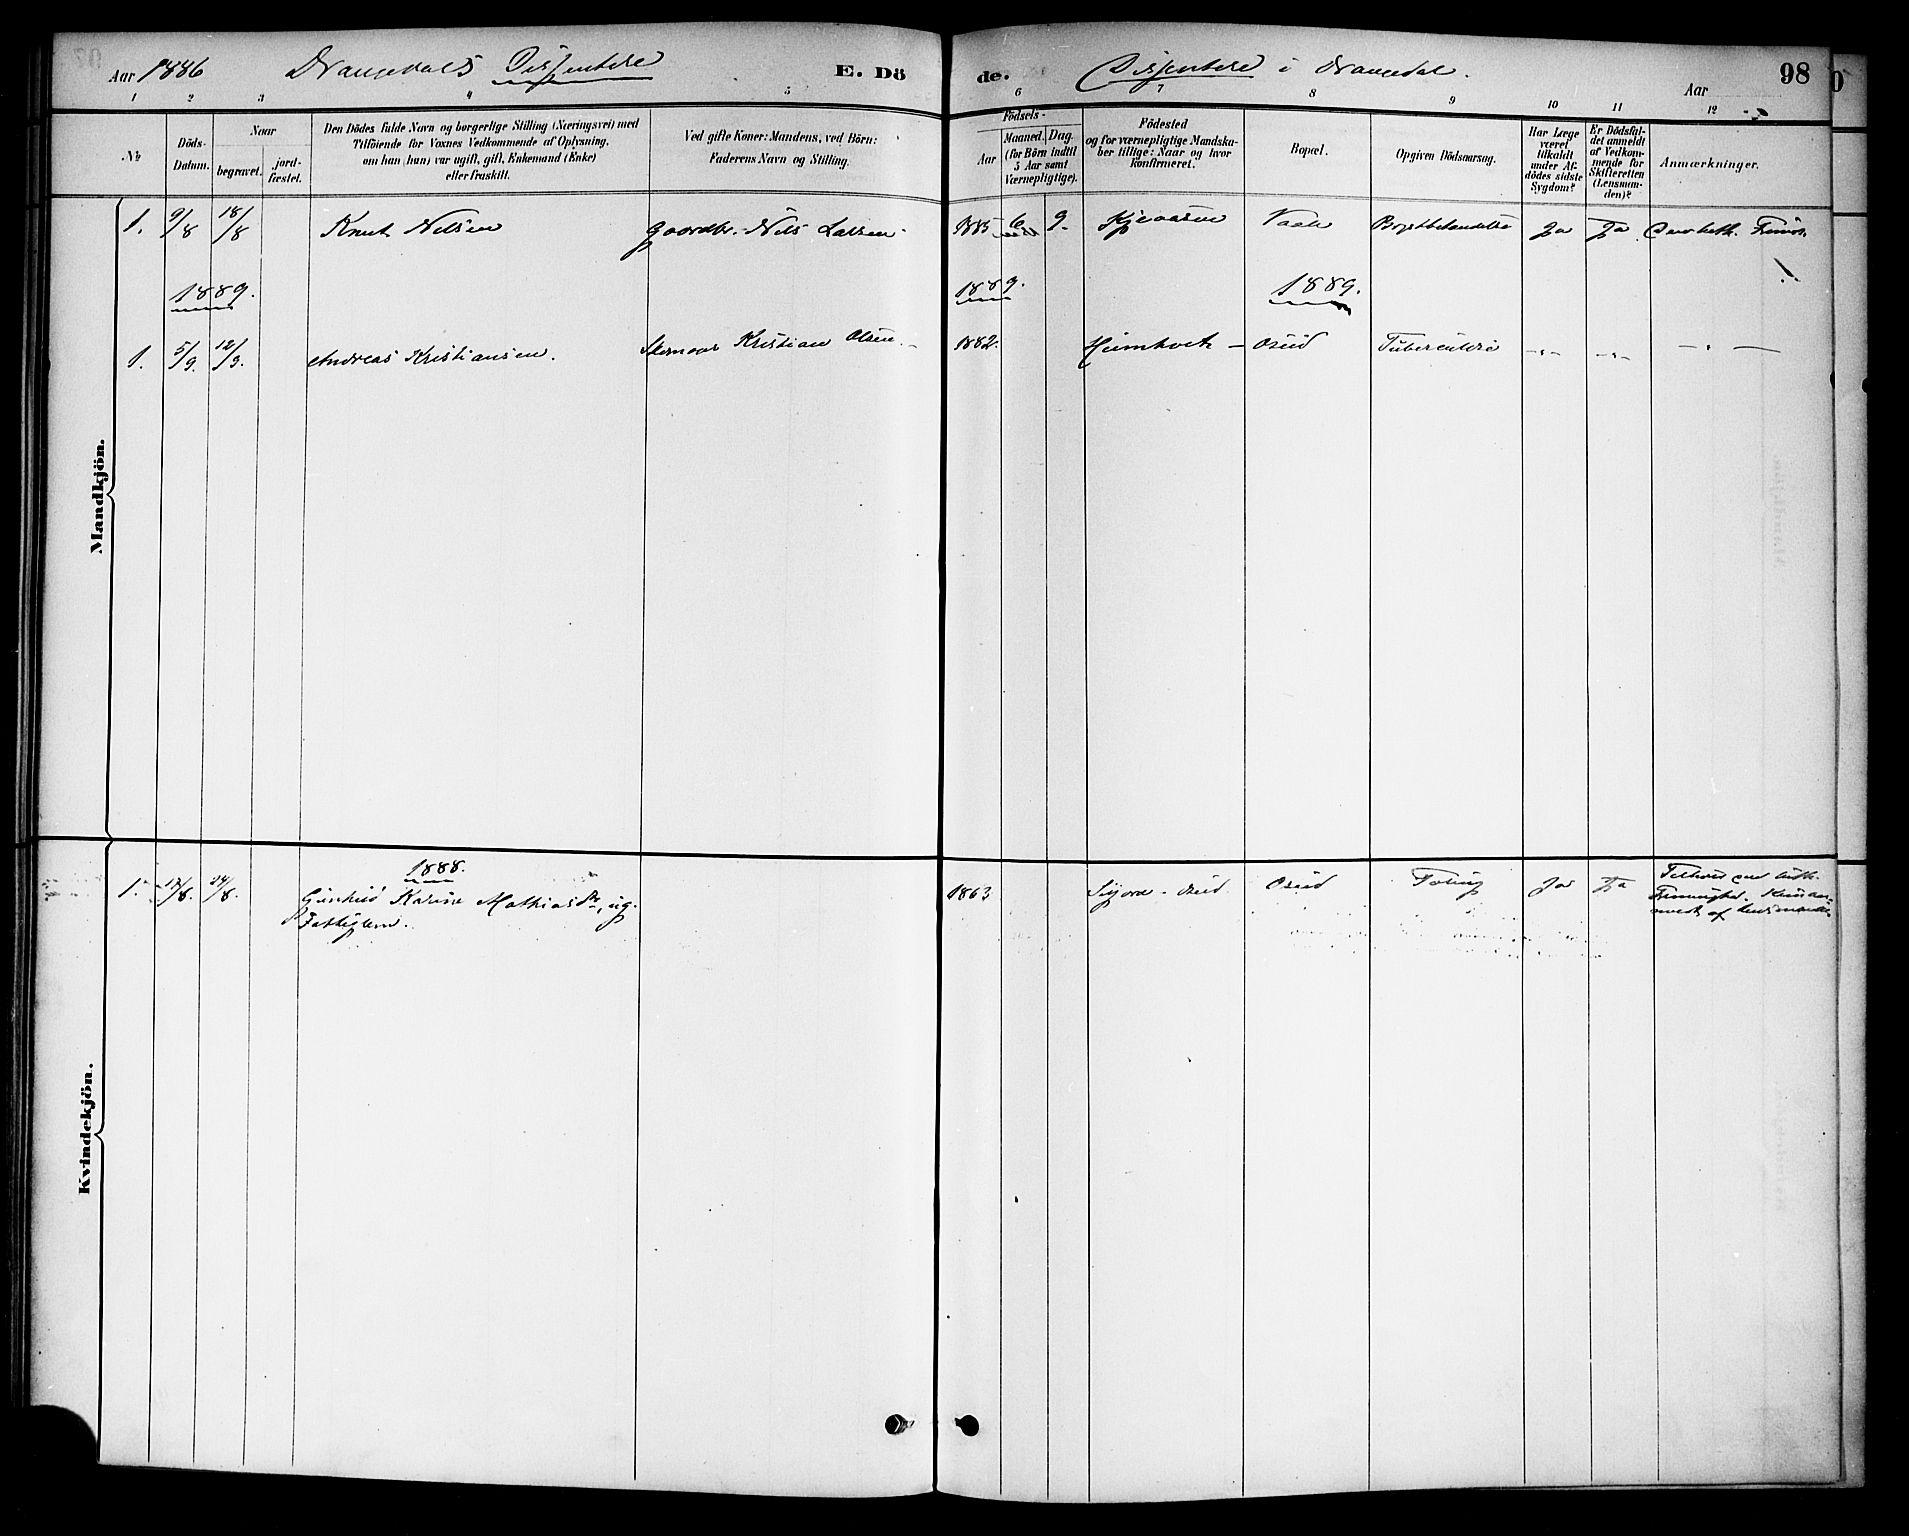 SAKO, Drangedal kirkebøker, F/Fa/L0011: Ministerialbok nr. 11 /1, 1885-1894, s. 98